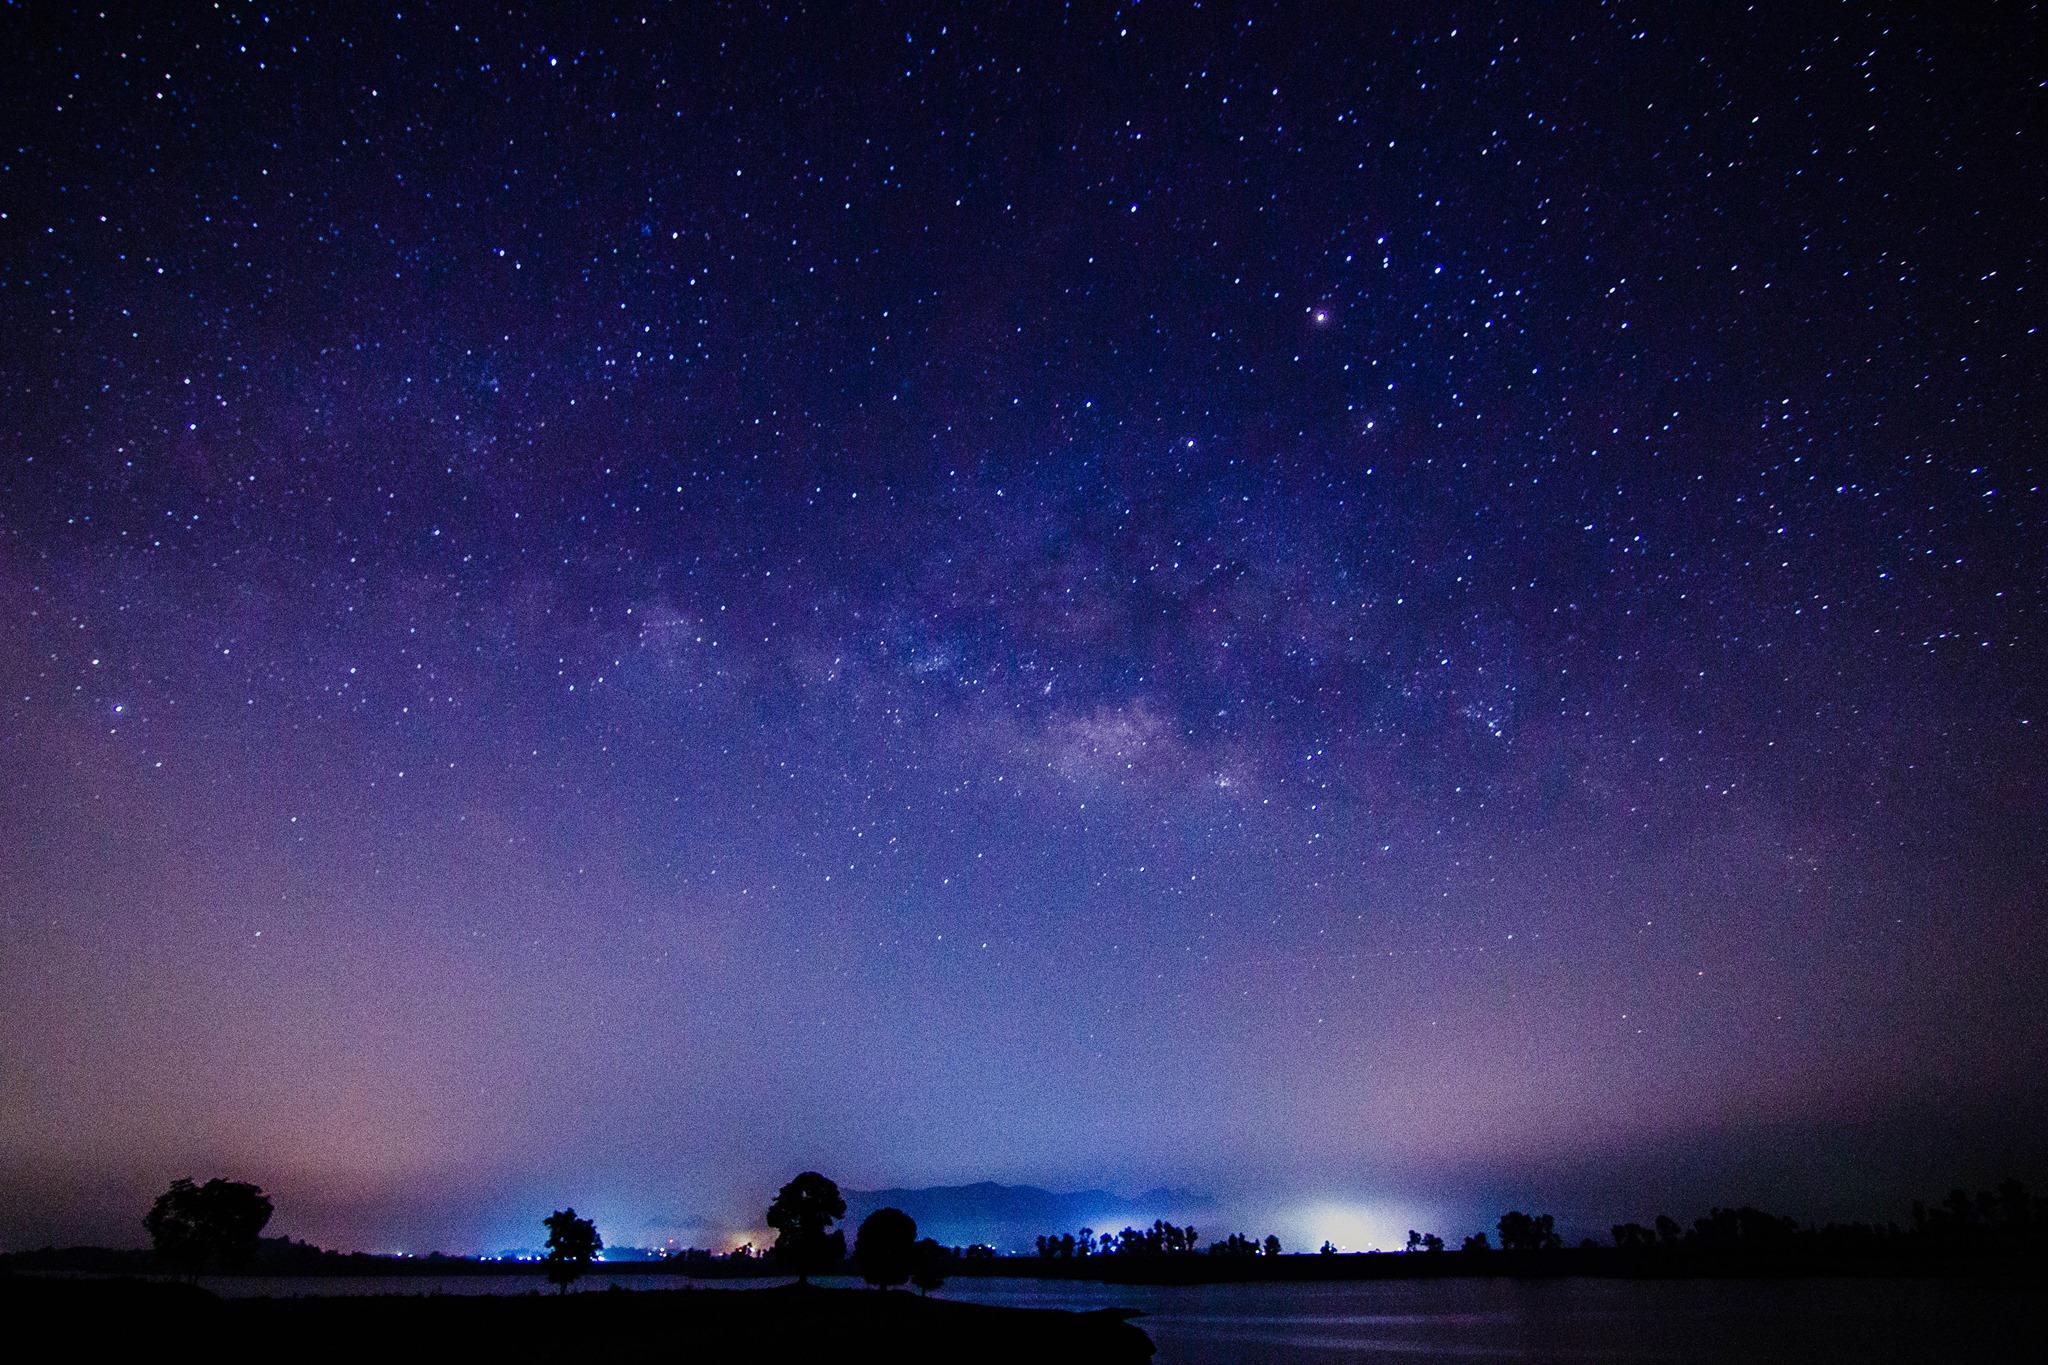 Observing the Stars at Vaitarna